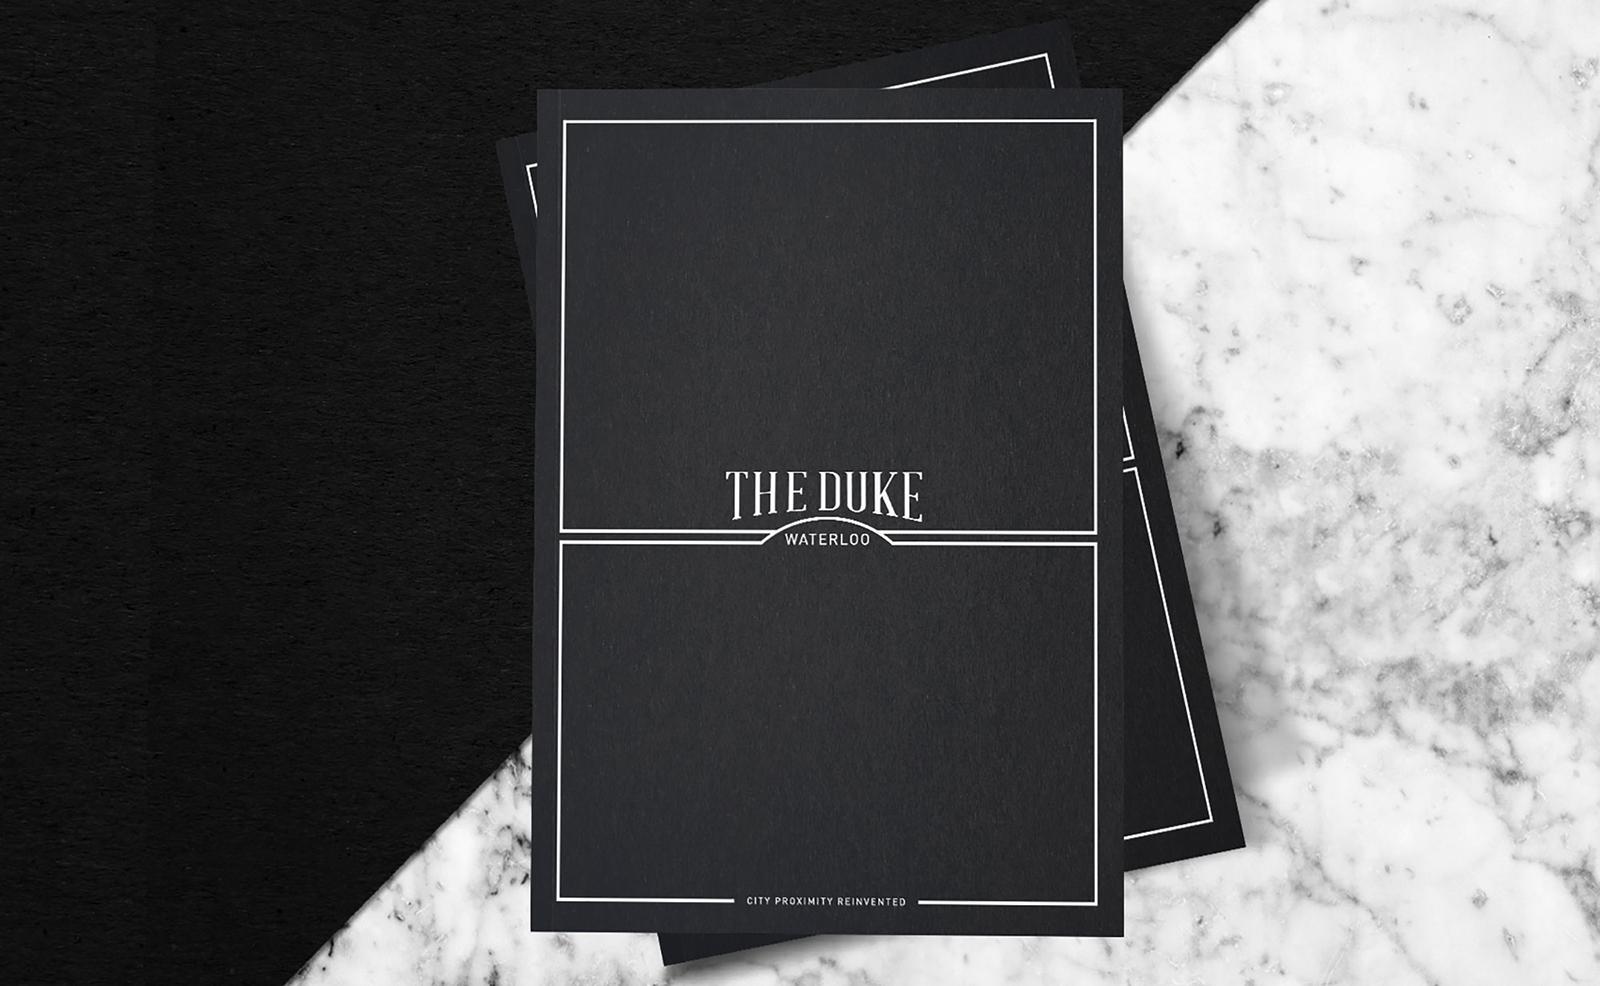 TheDukeBrochure01-min1